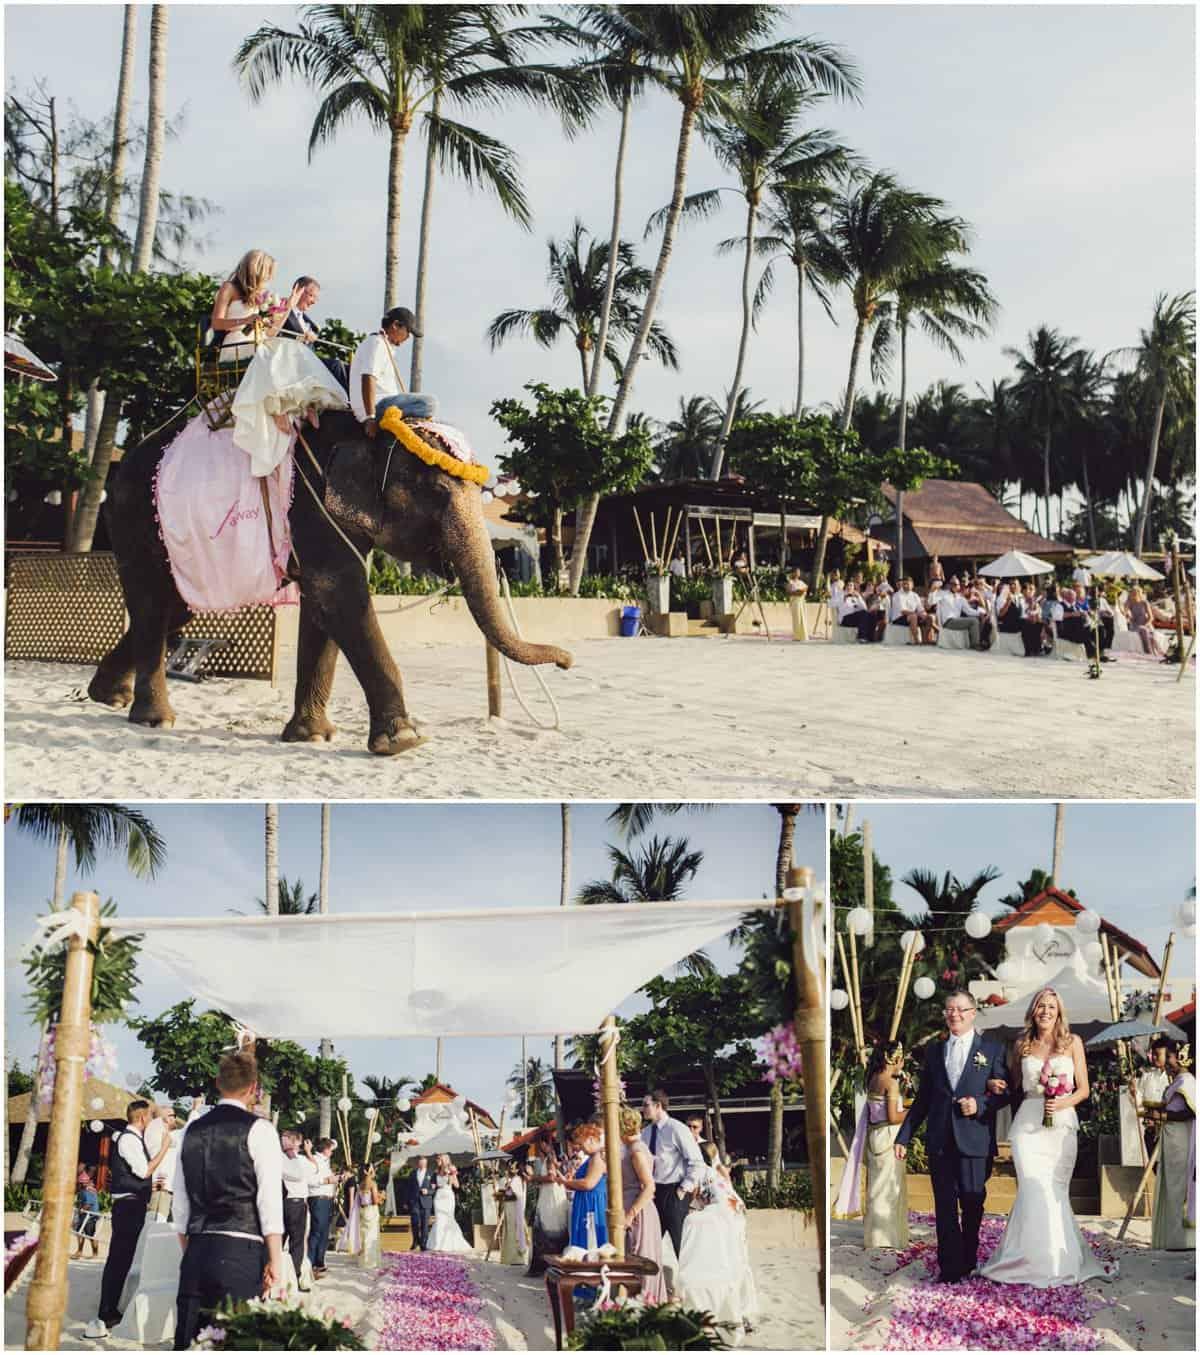 Faraway Villa Koh Samui Thailand wedding